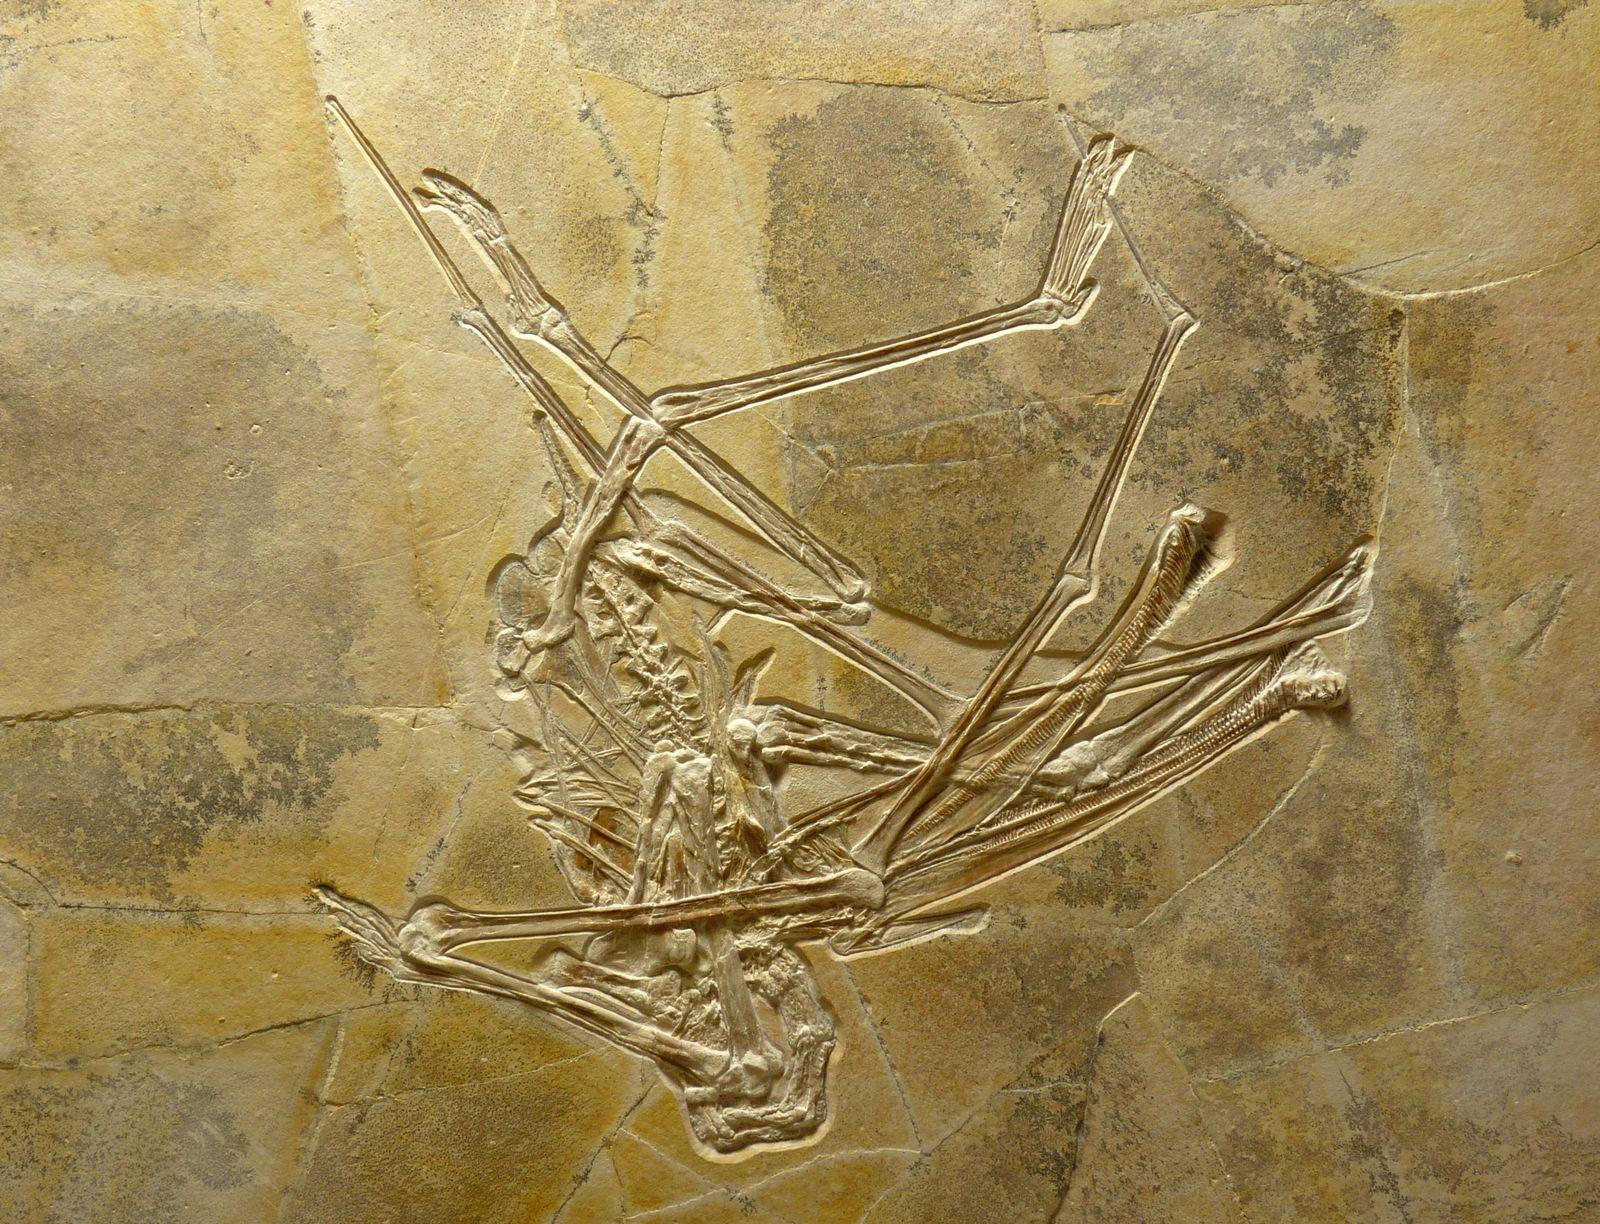 Flugsaurier-Skelett / Wattendorf